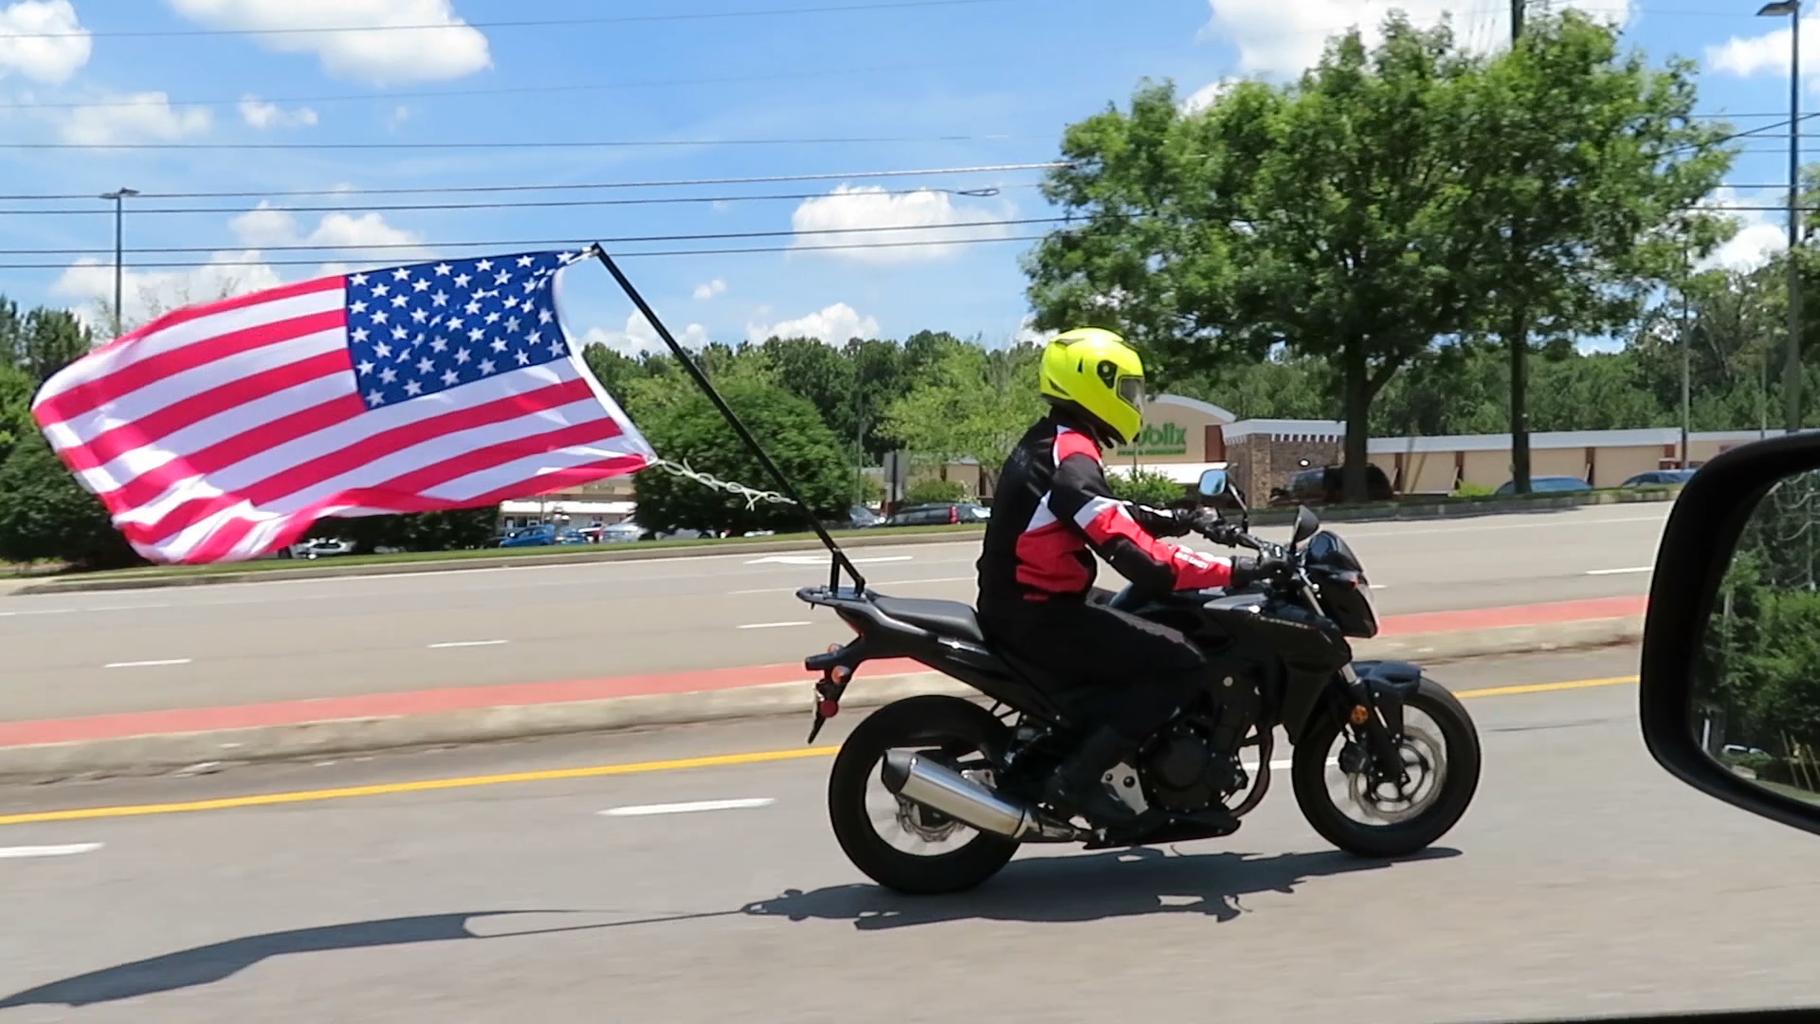 Huge Motorcycle Flag Pole